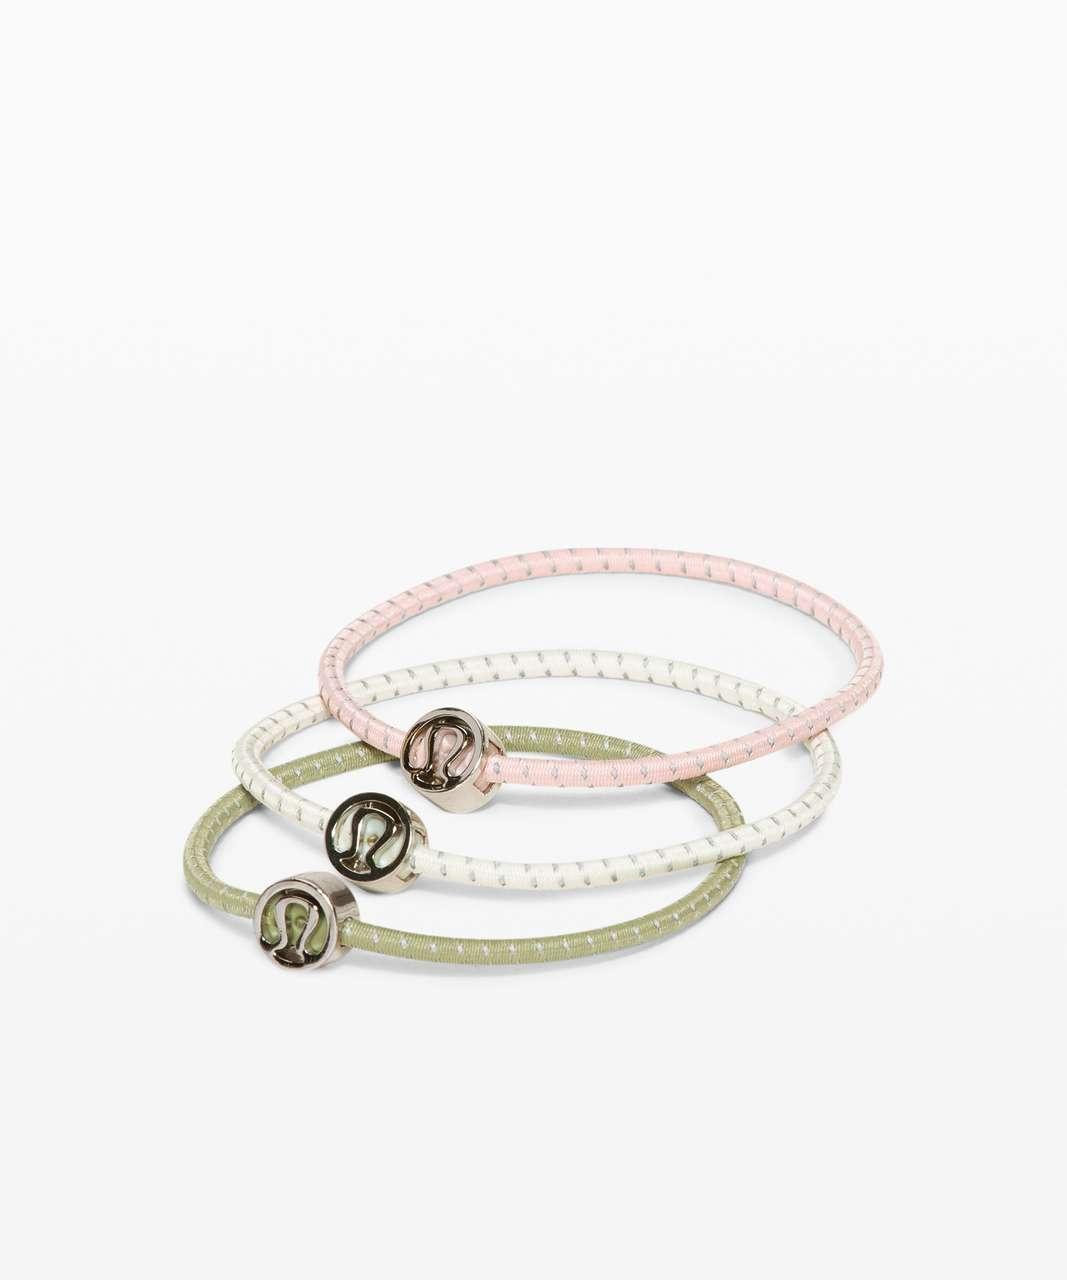 Lululemon Glow On Hair Ties - Antique White / Vista Green / Misty Pink